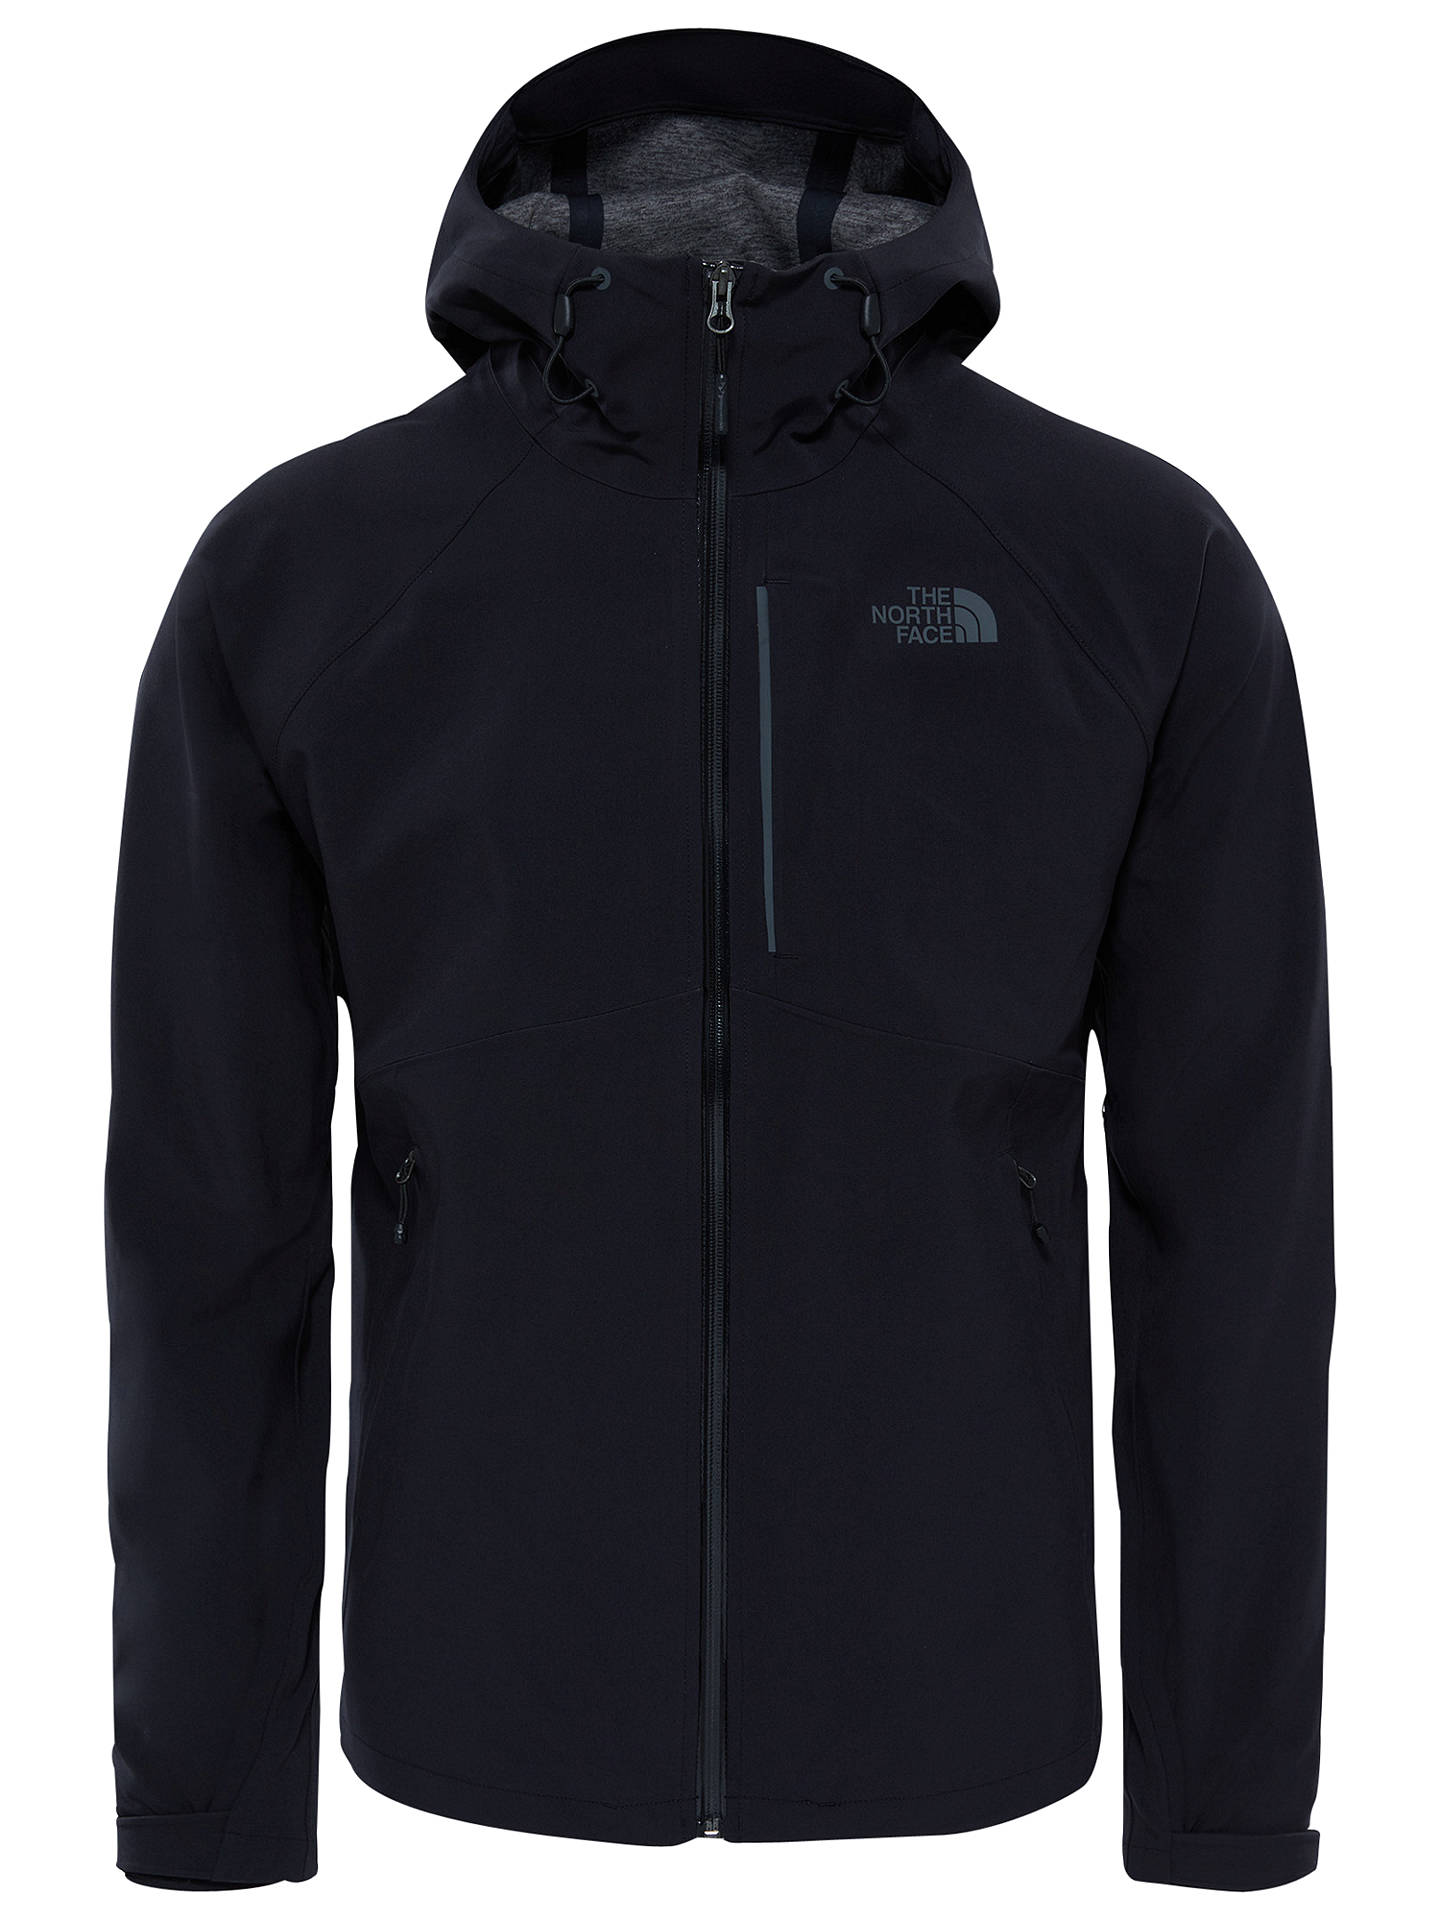 BuyThe North Face Apex Flex Shell Jacket 2ef2851a3